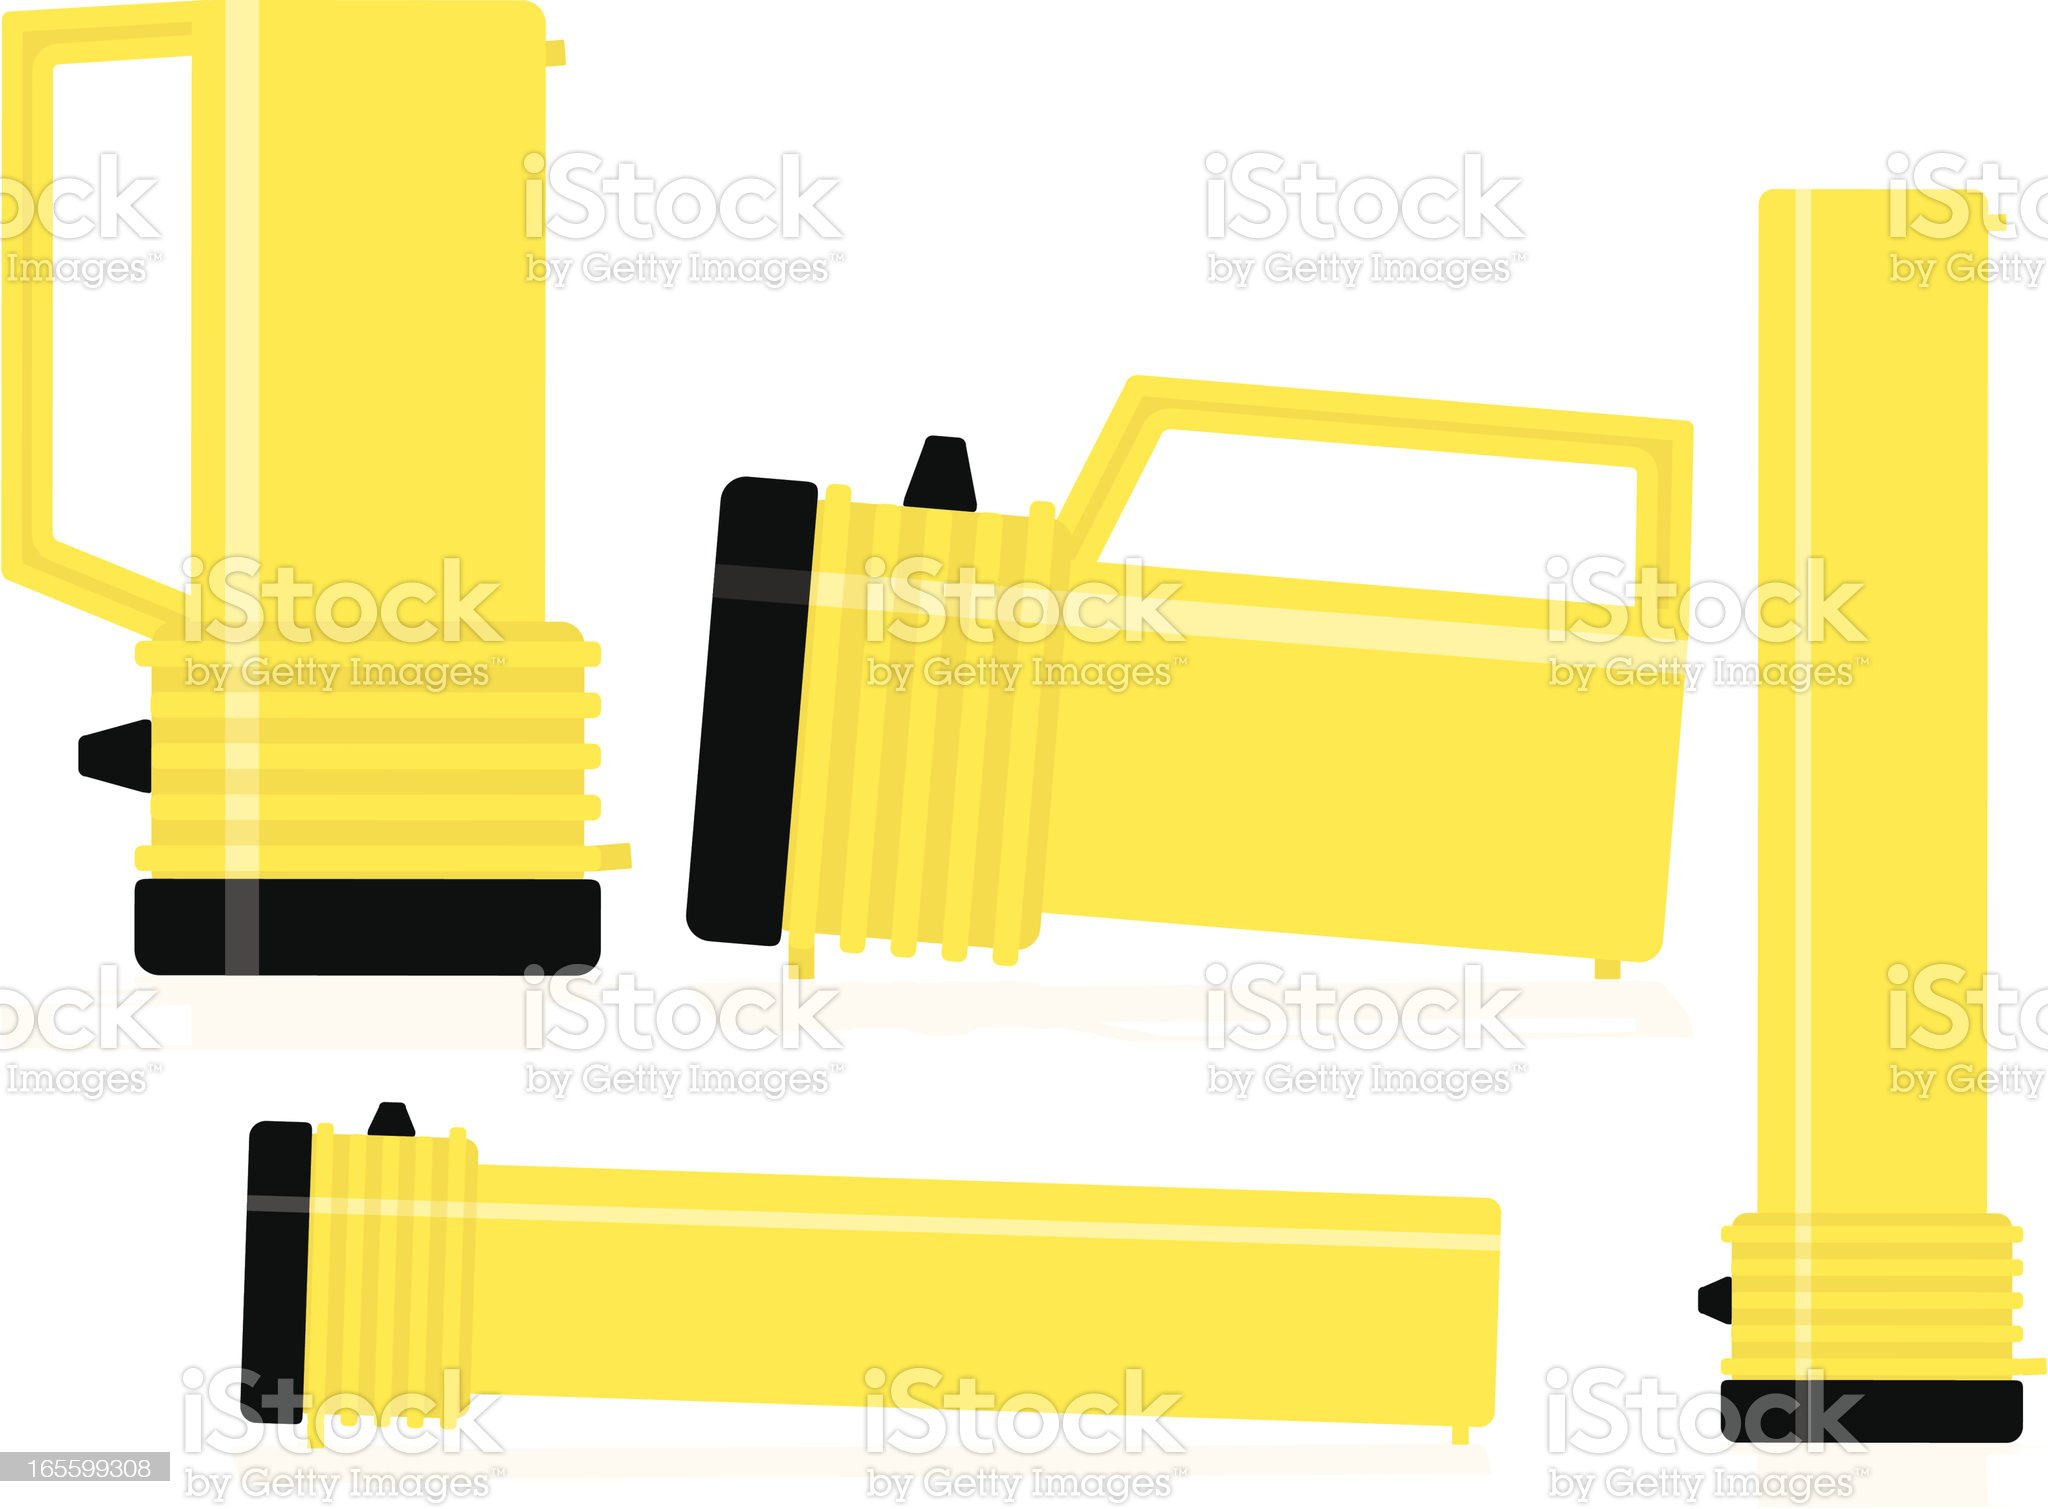 Heavy Duty and Regular Flashlights in Various Positions royalty-free stock vector art